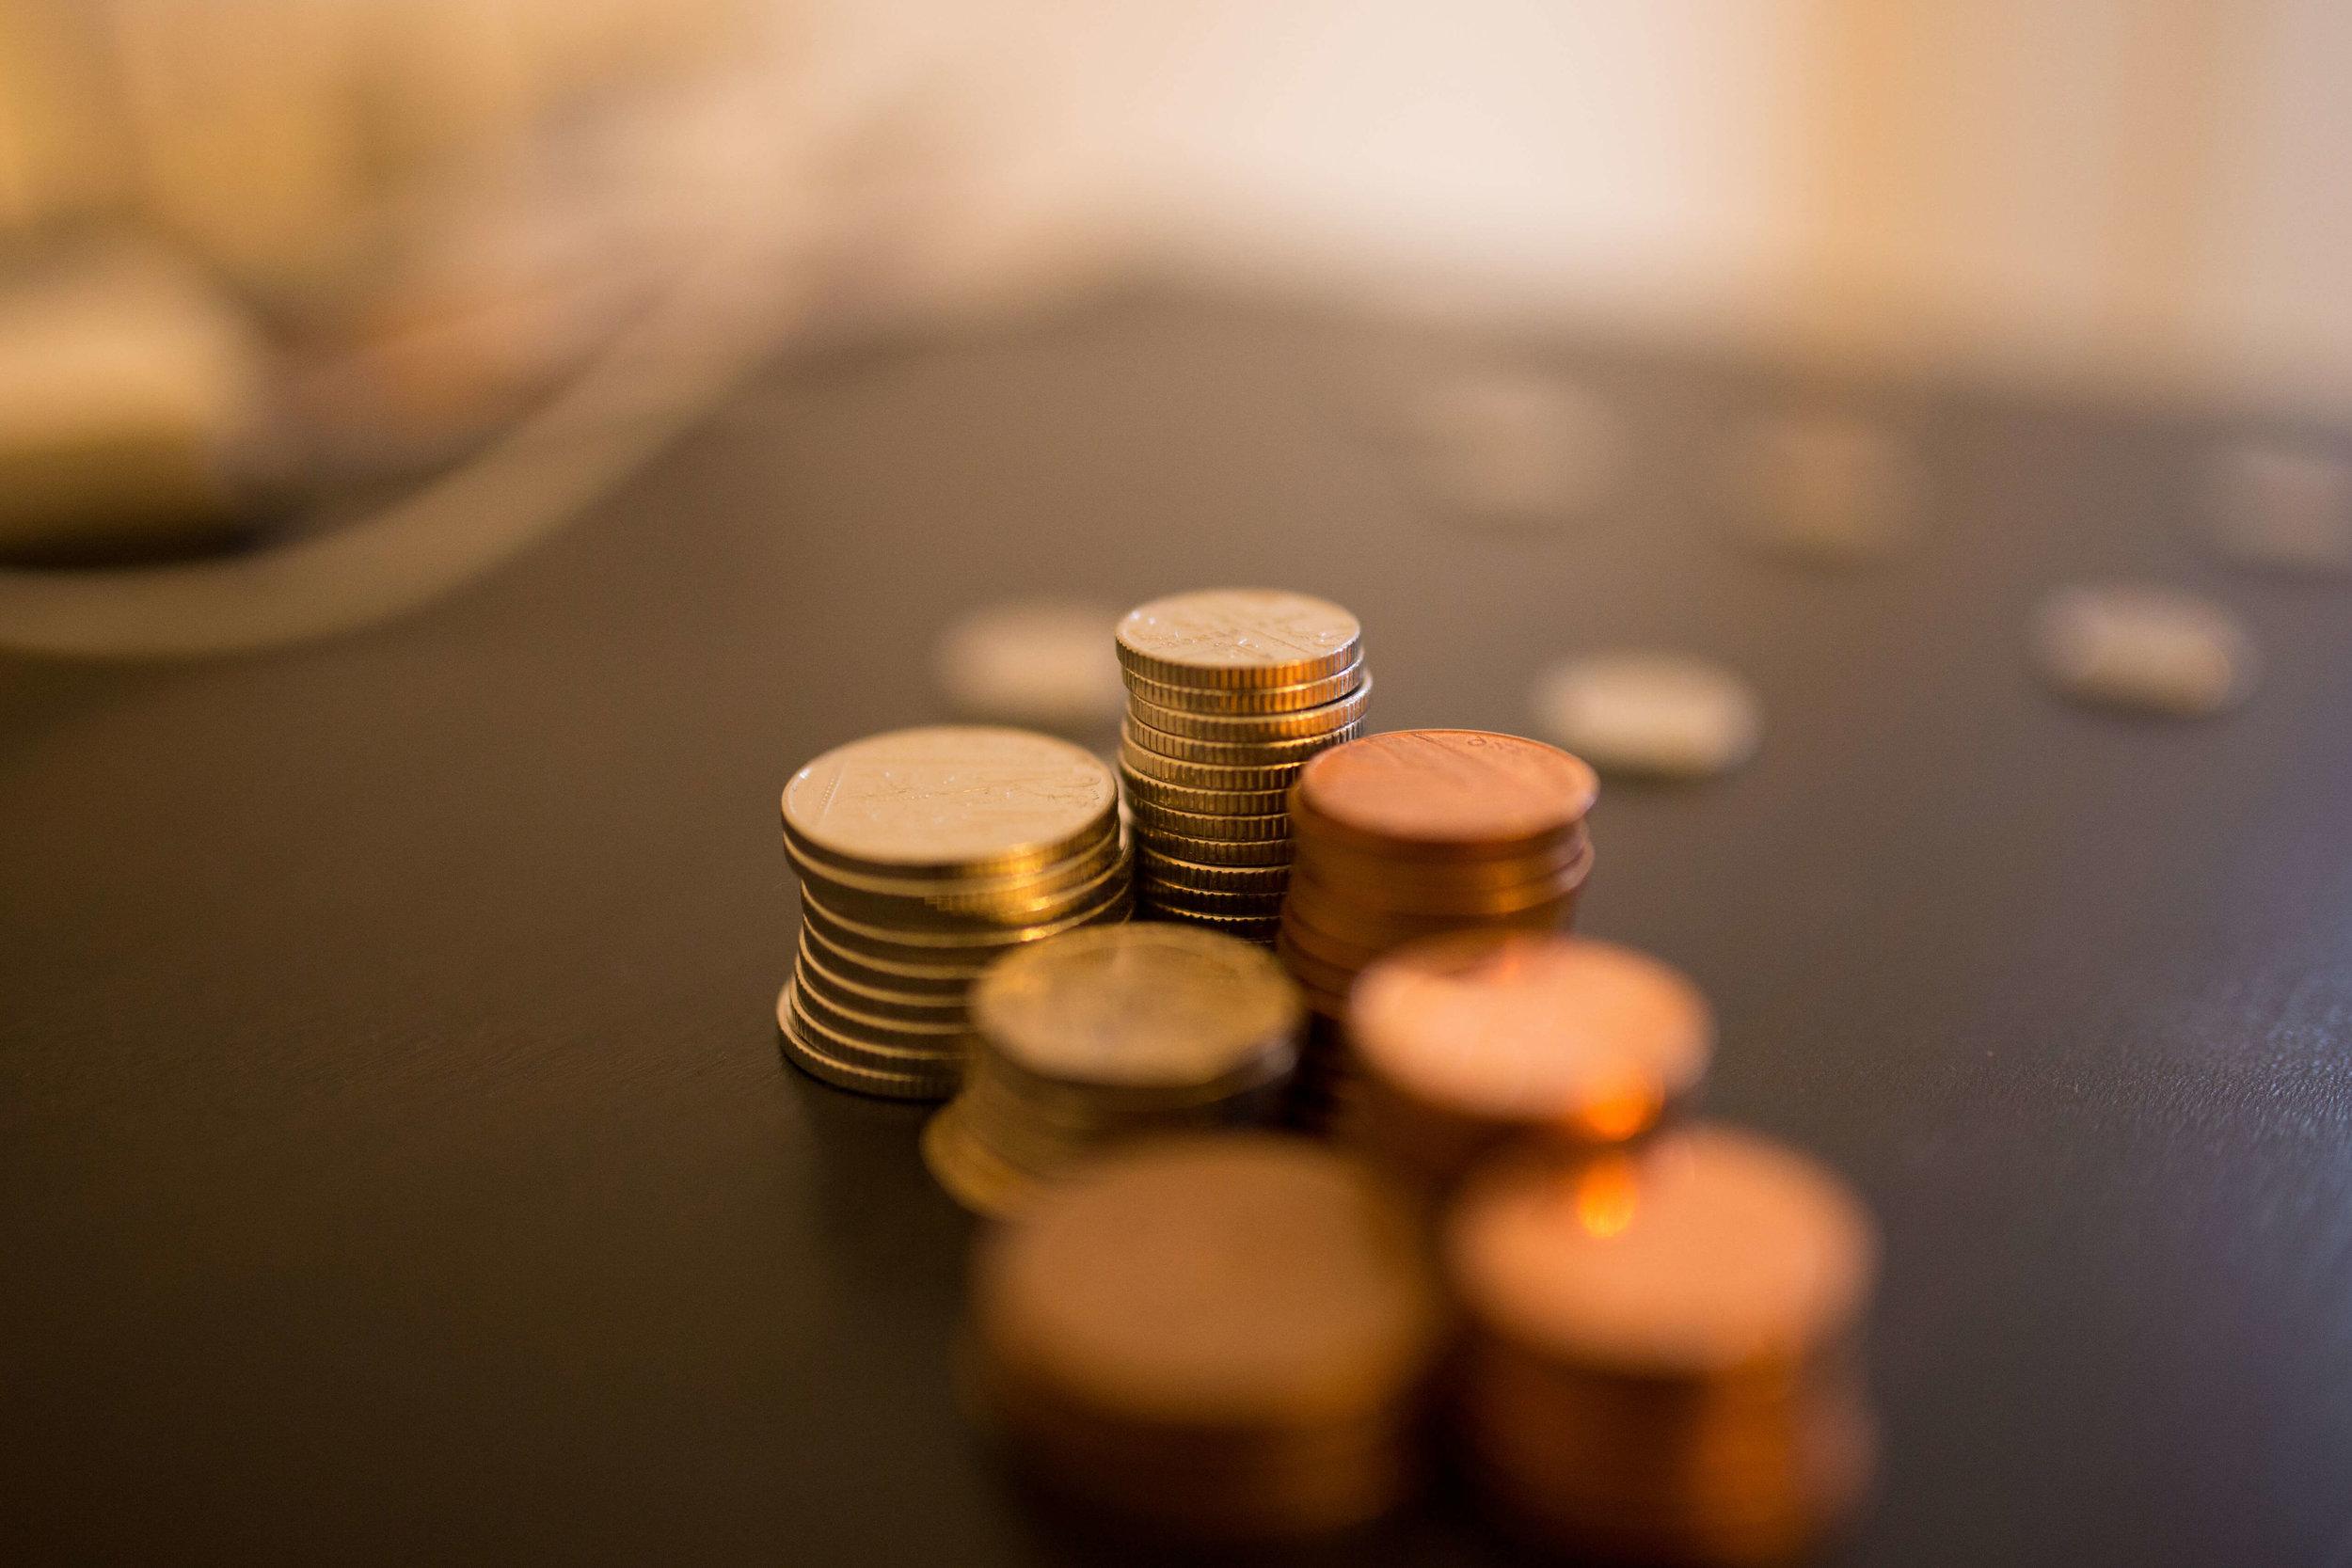 CNN: Nickel & Dimed by Insurance Companies -